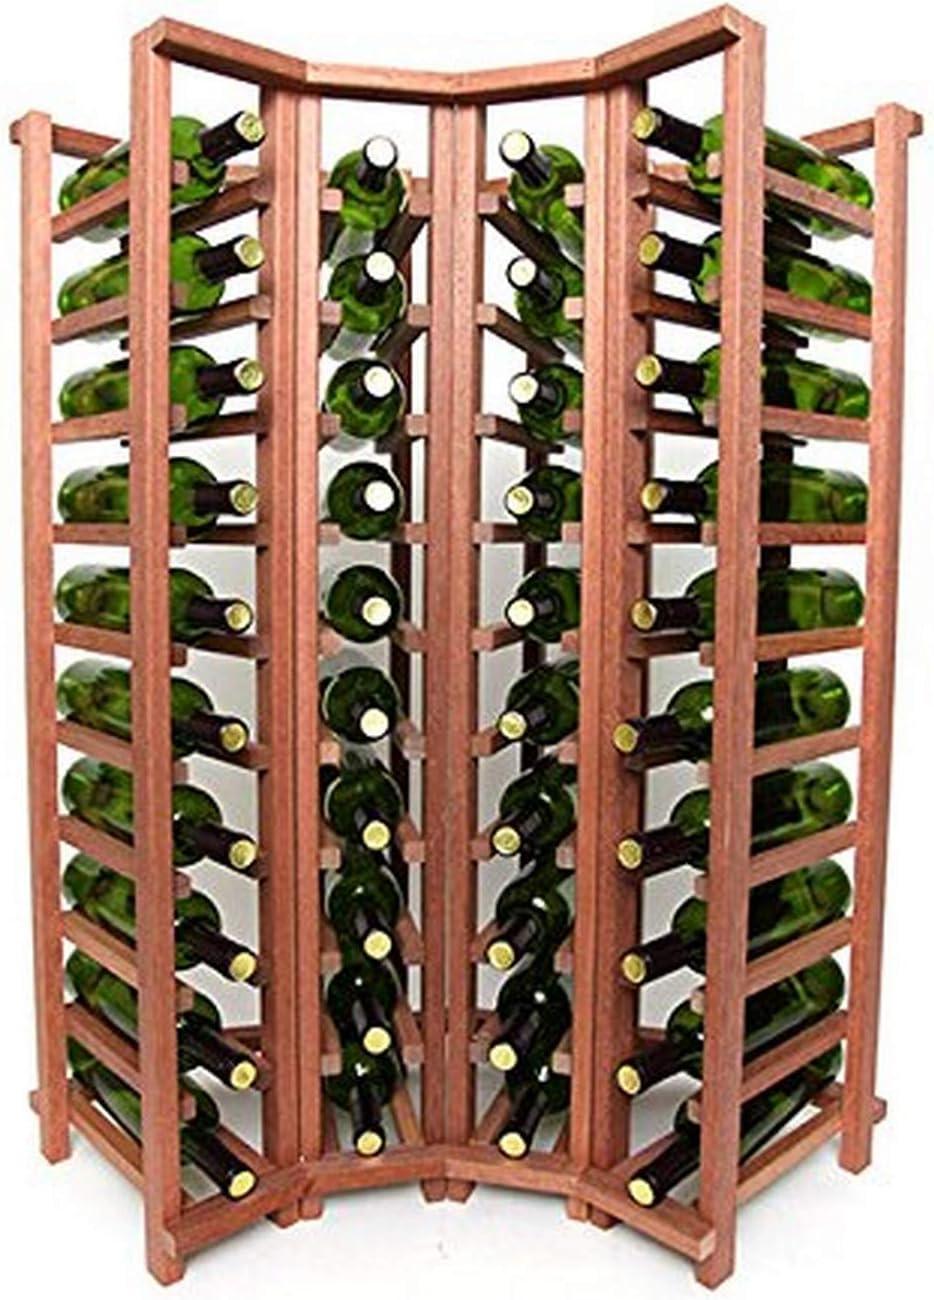 Wine Racks Wineracks 813-070-2400-3975 40 Max 51% OFF Series Cellar Prestige At the price of surprise